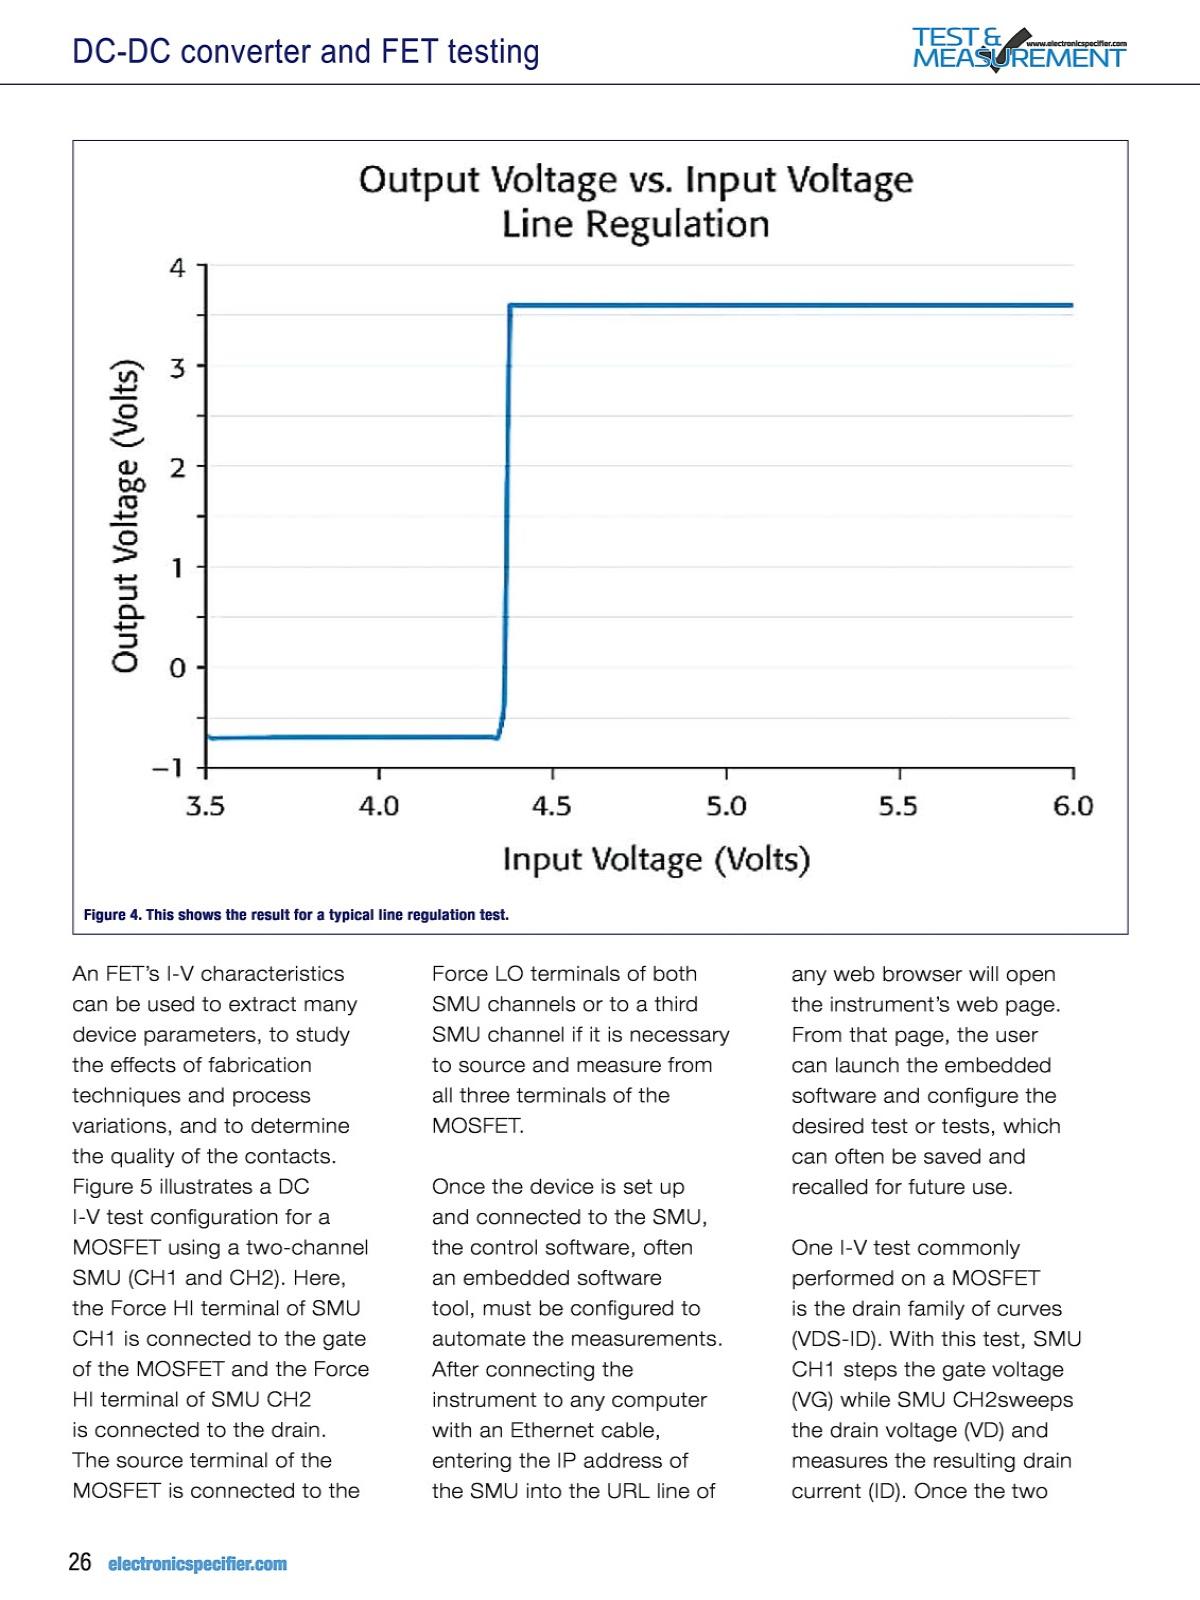 MYEBOOK - EST&M - June 2018: Sensor + Test Supplement